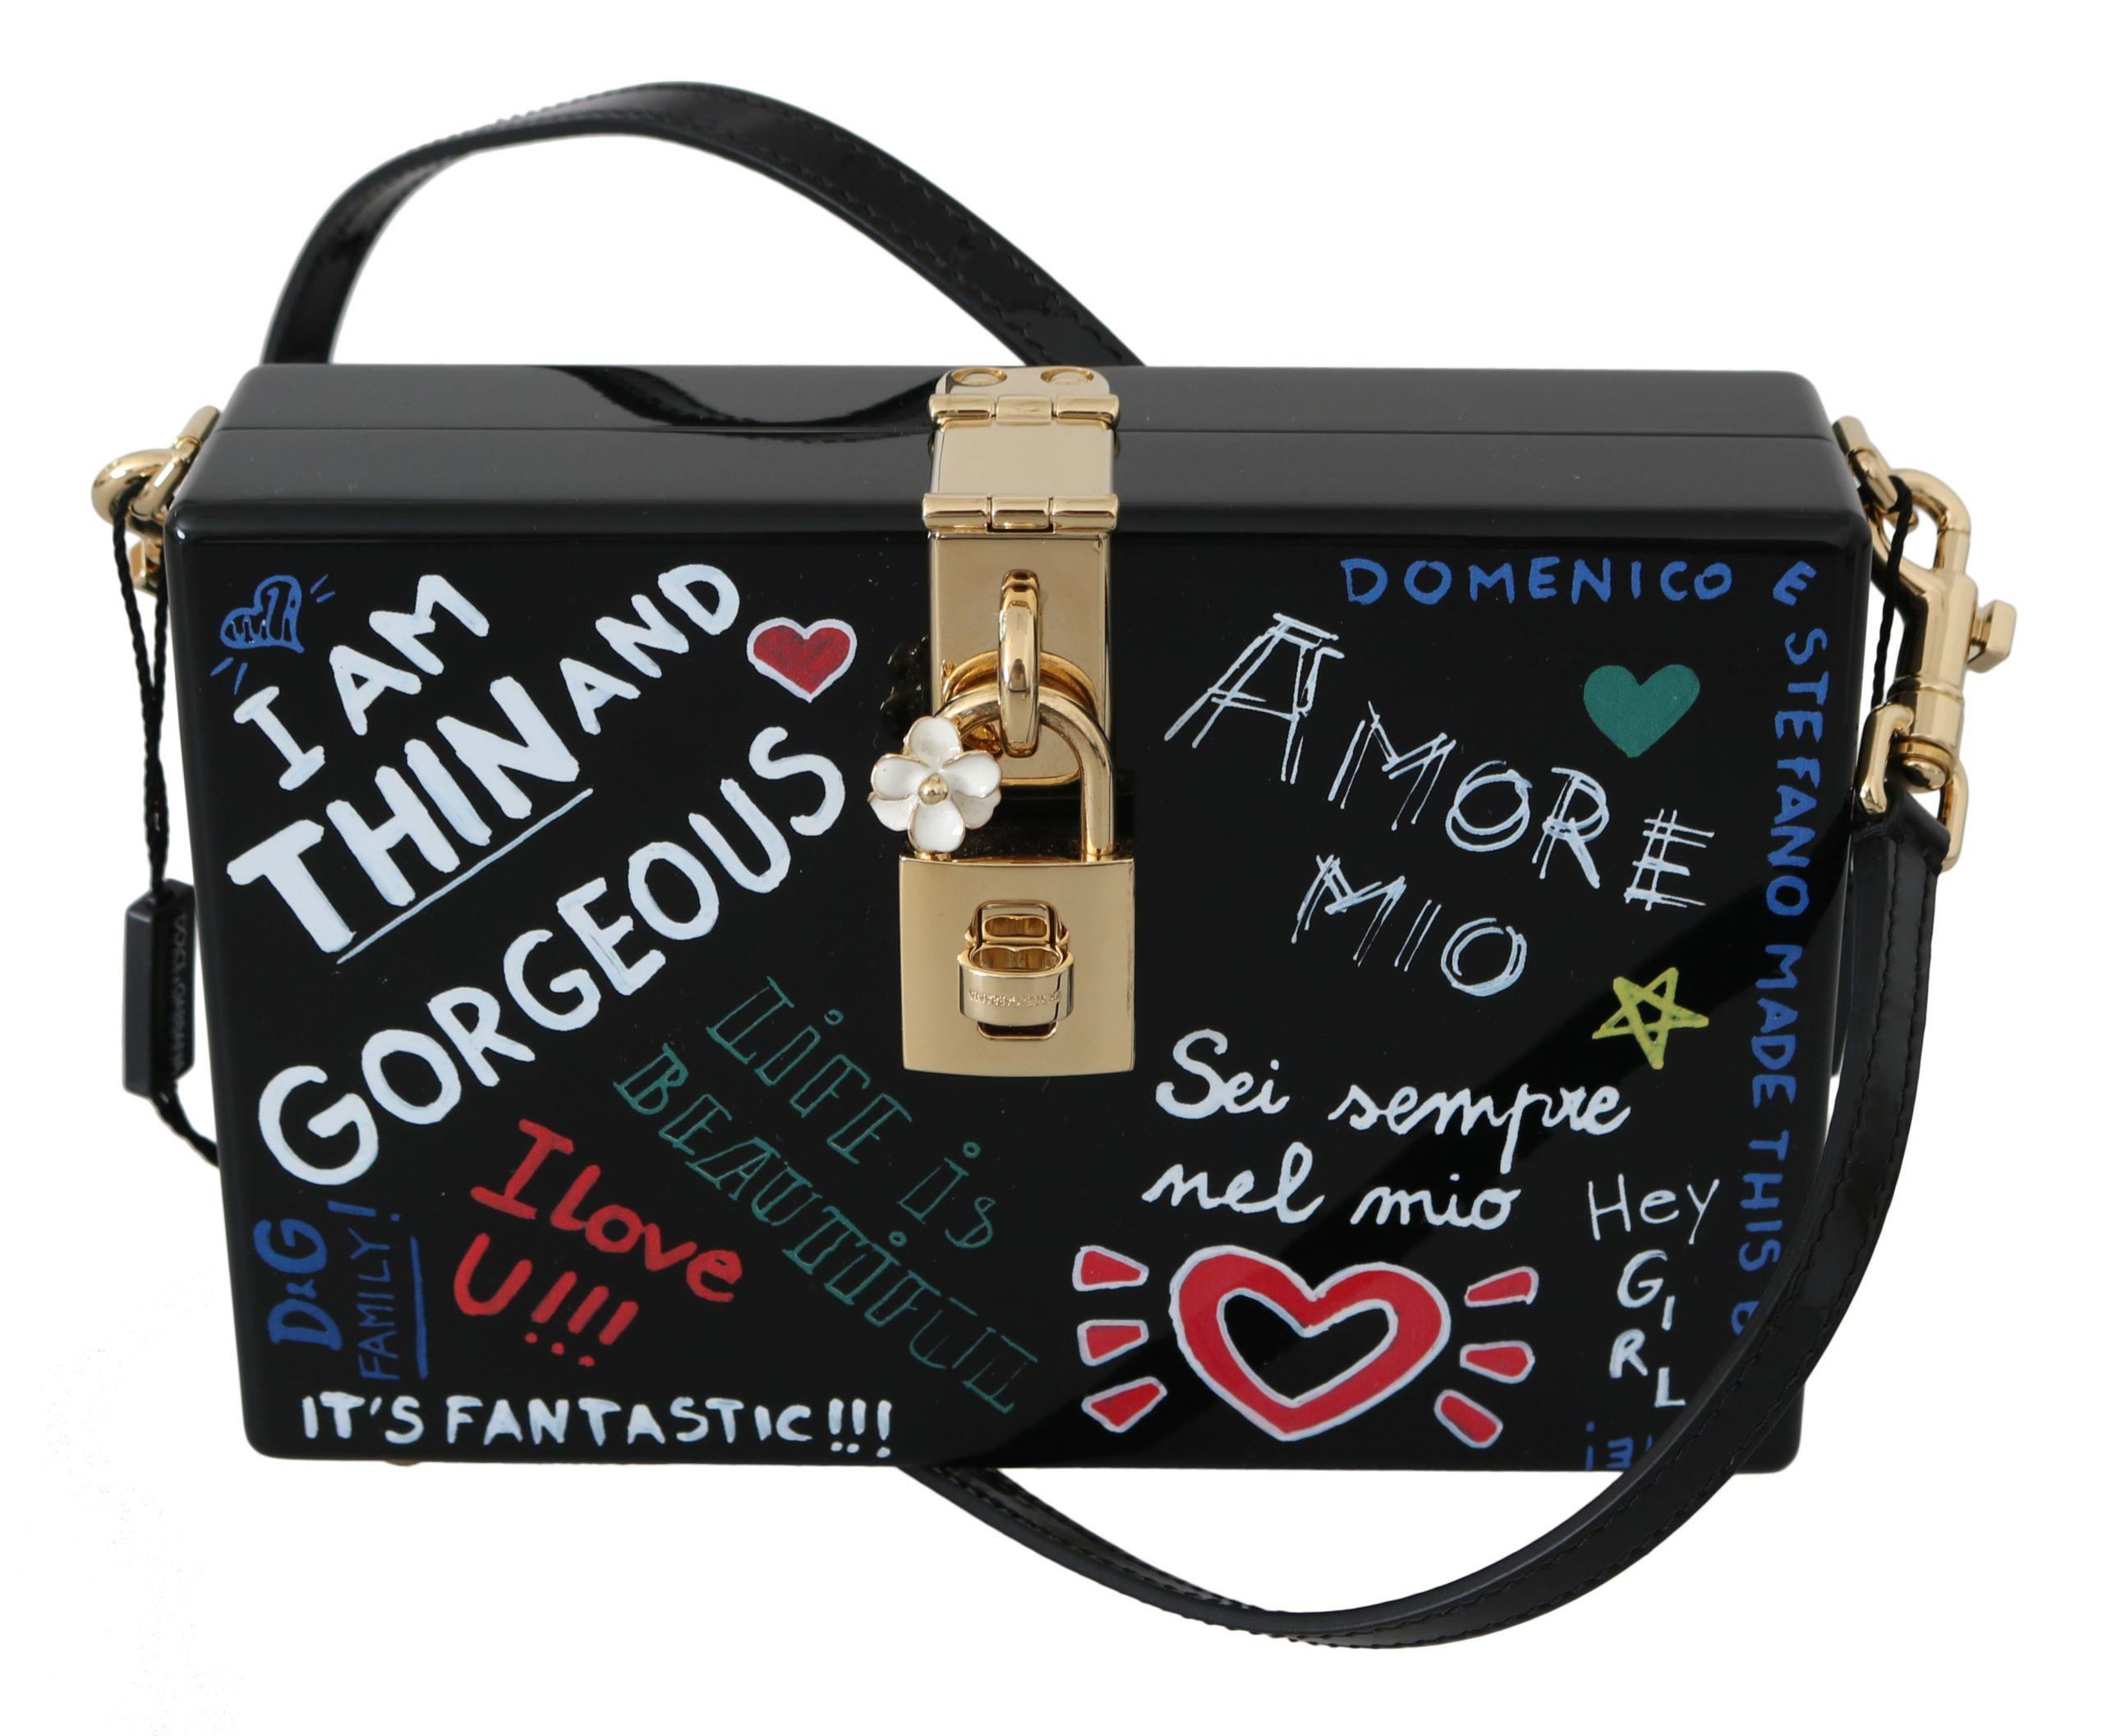 Dolce & Gabbana Women's Hand Painted Wooden Leather Shoulder Bag Black VAS8695